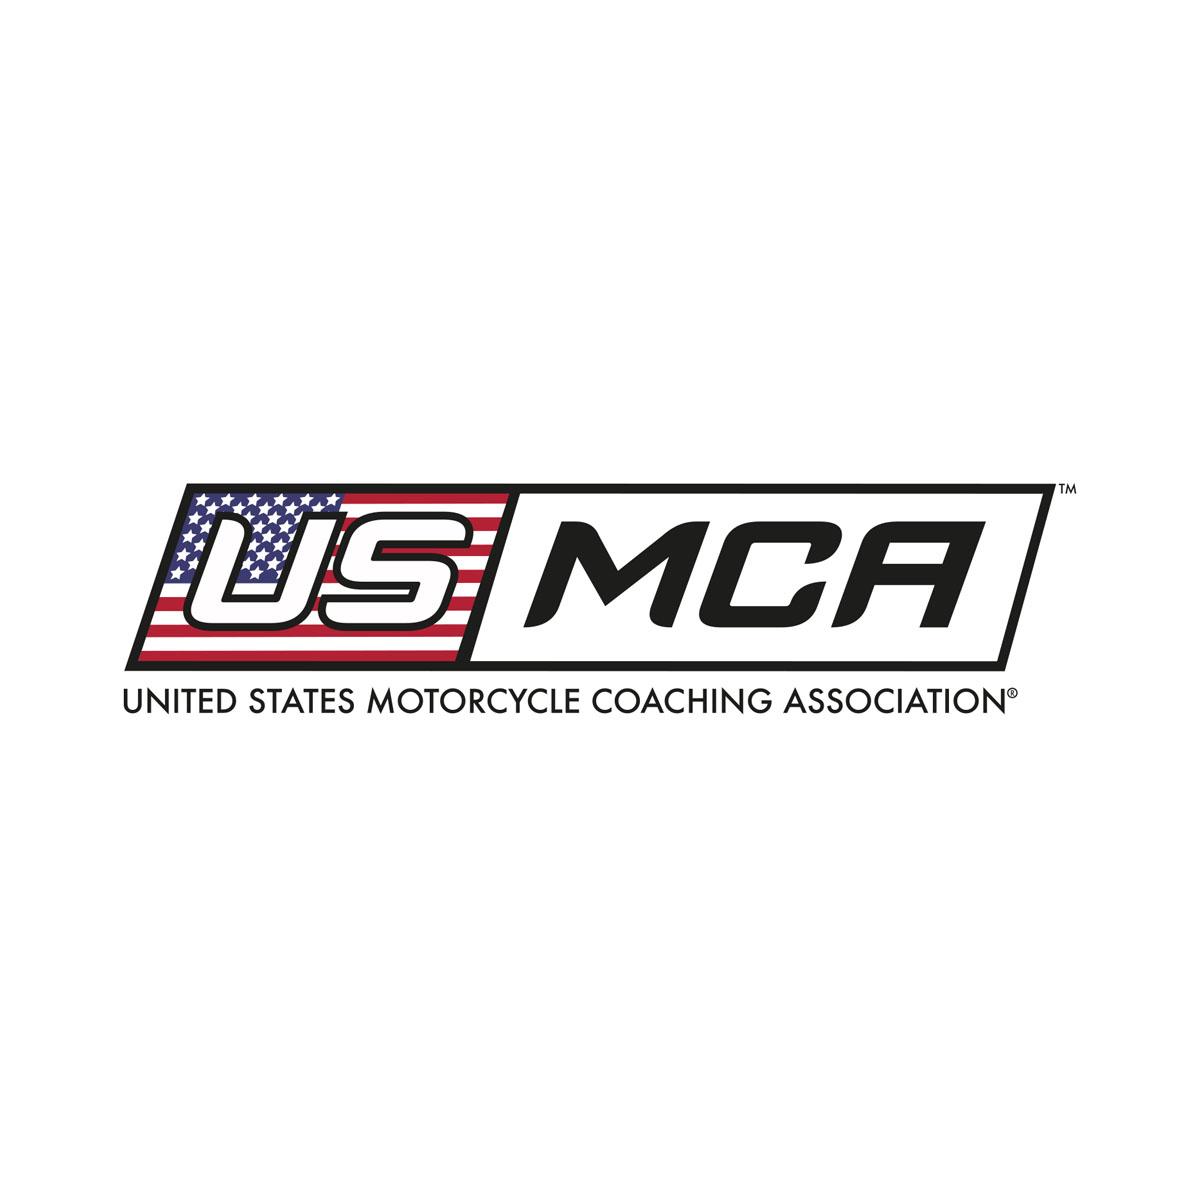 USMCA.jpg